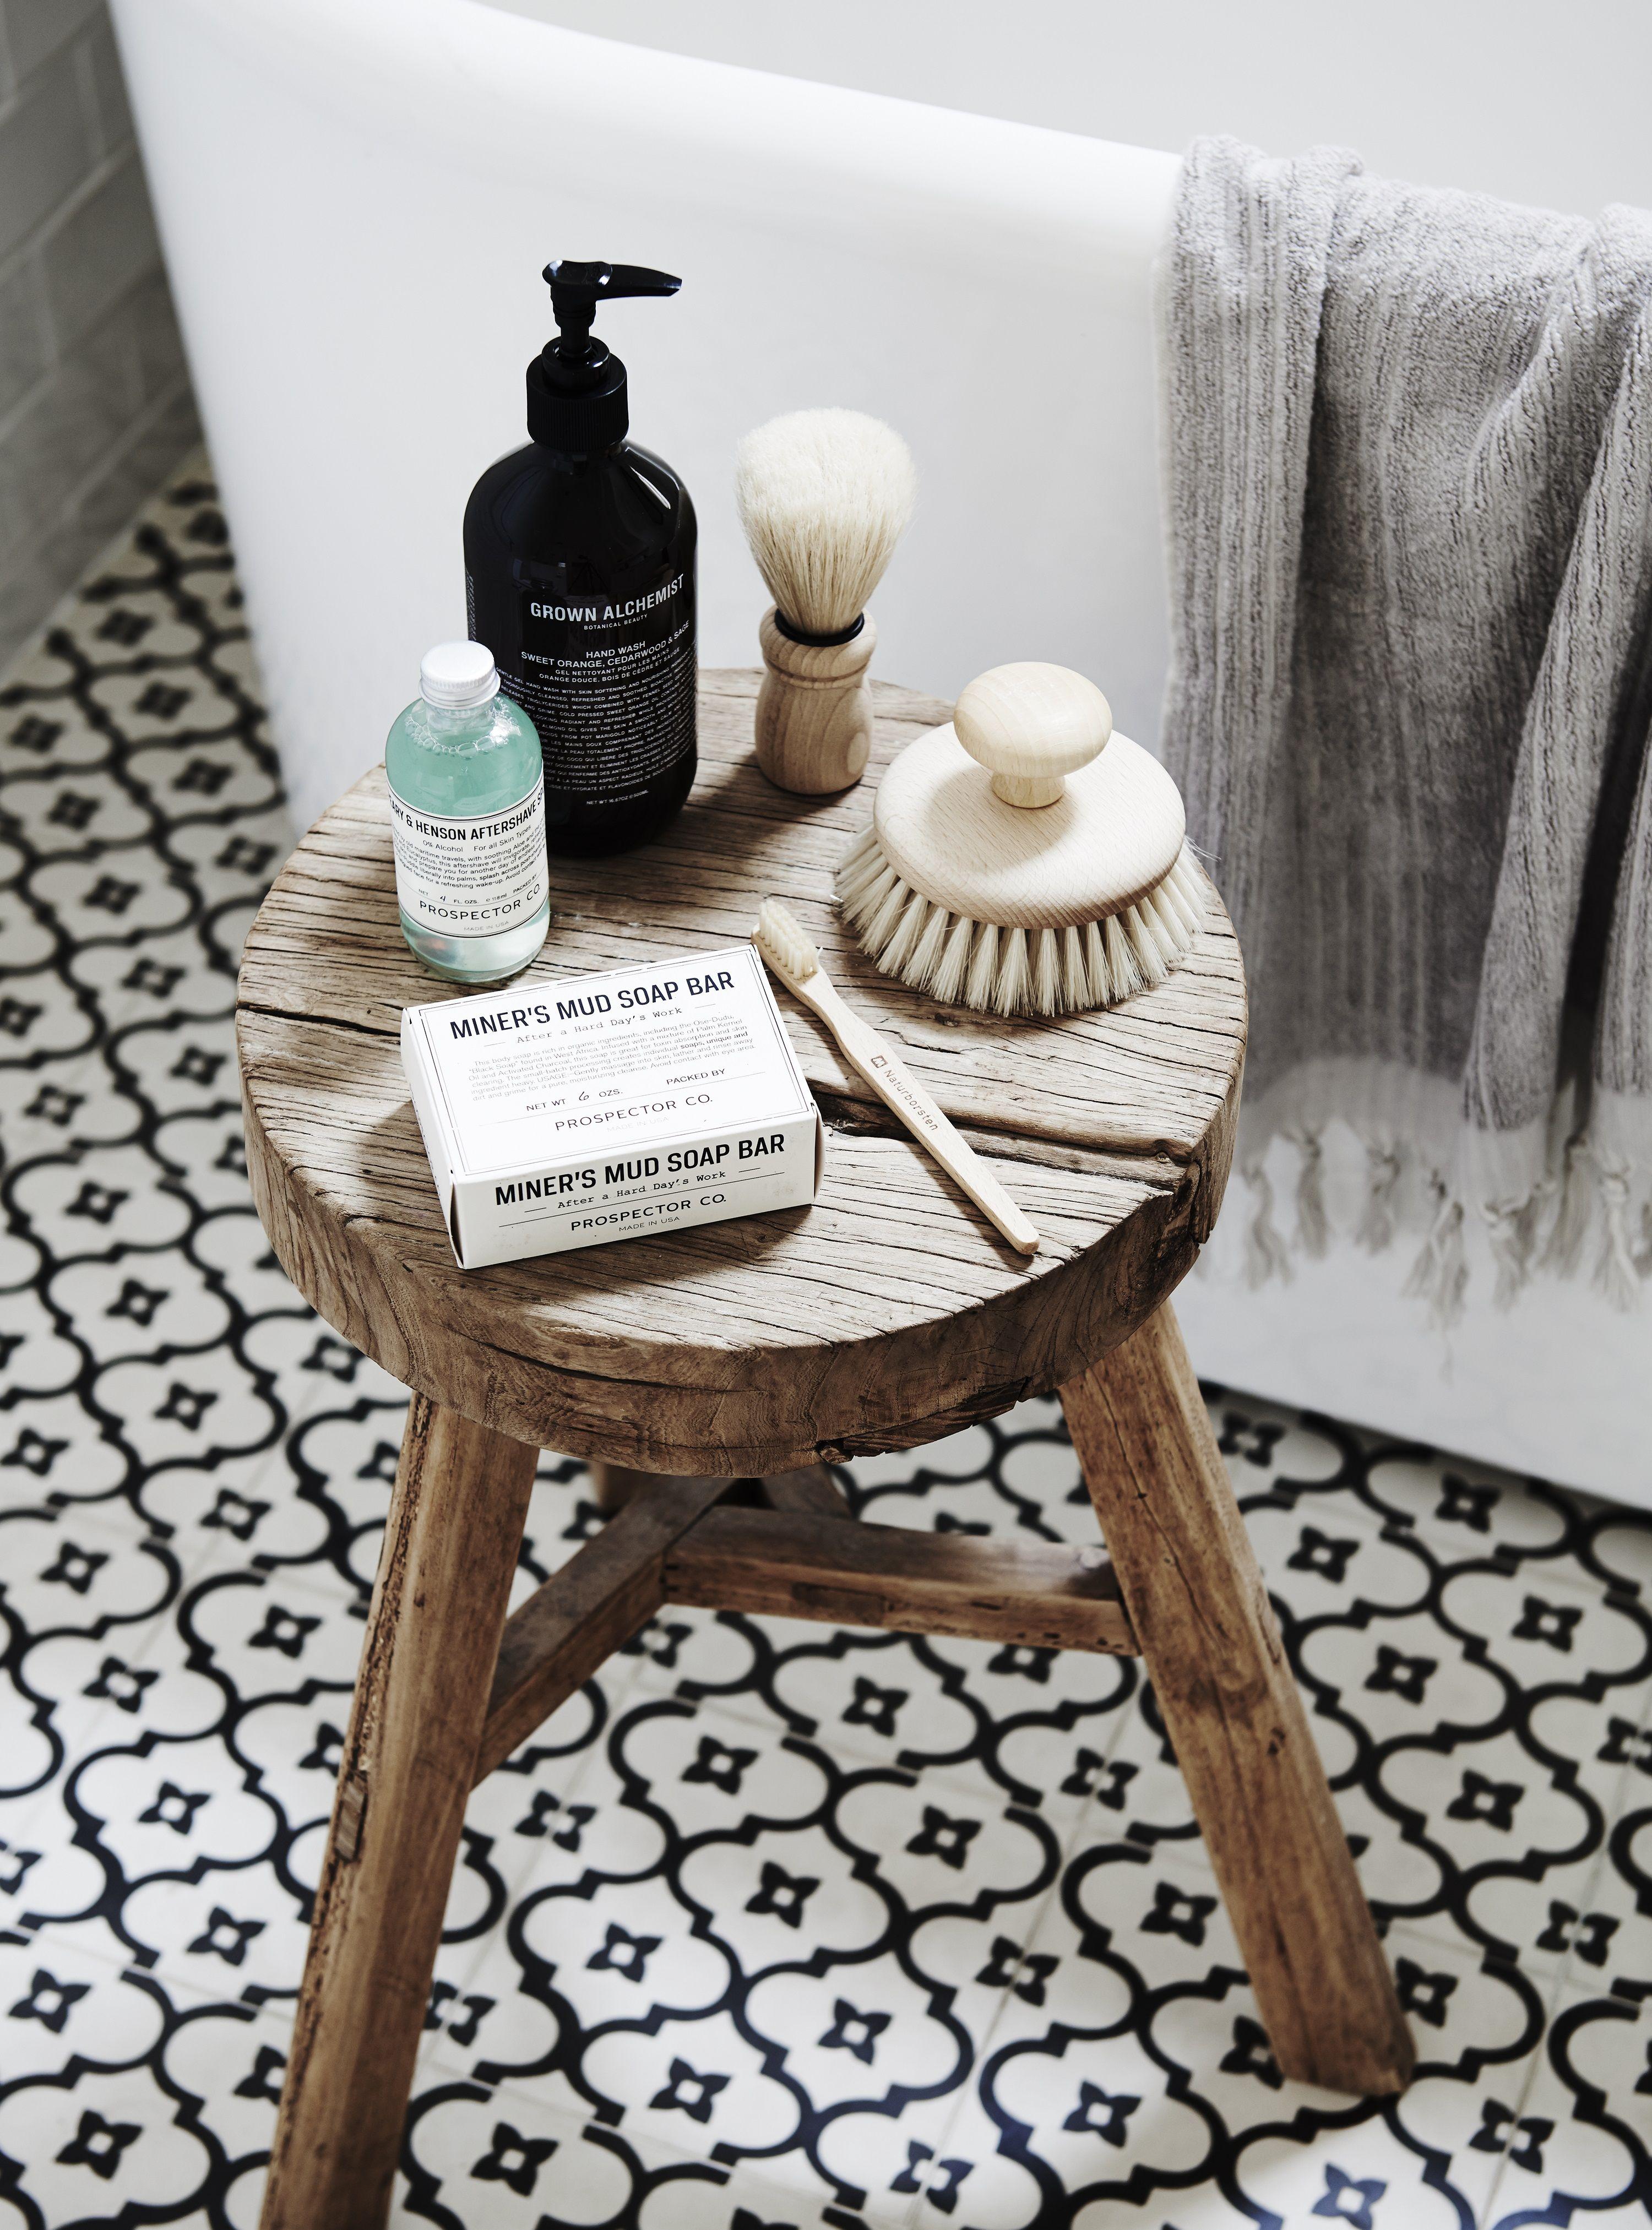 Bloom & Co bathroom accessories. | 家居拍摄图 | Pinterest | Bathroom ...